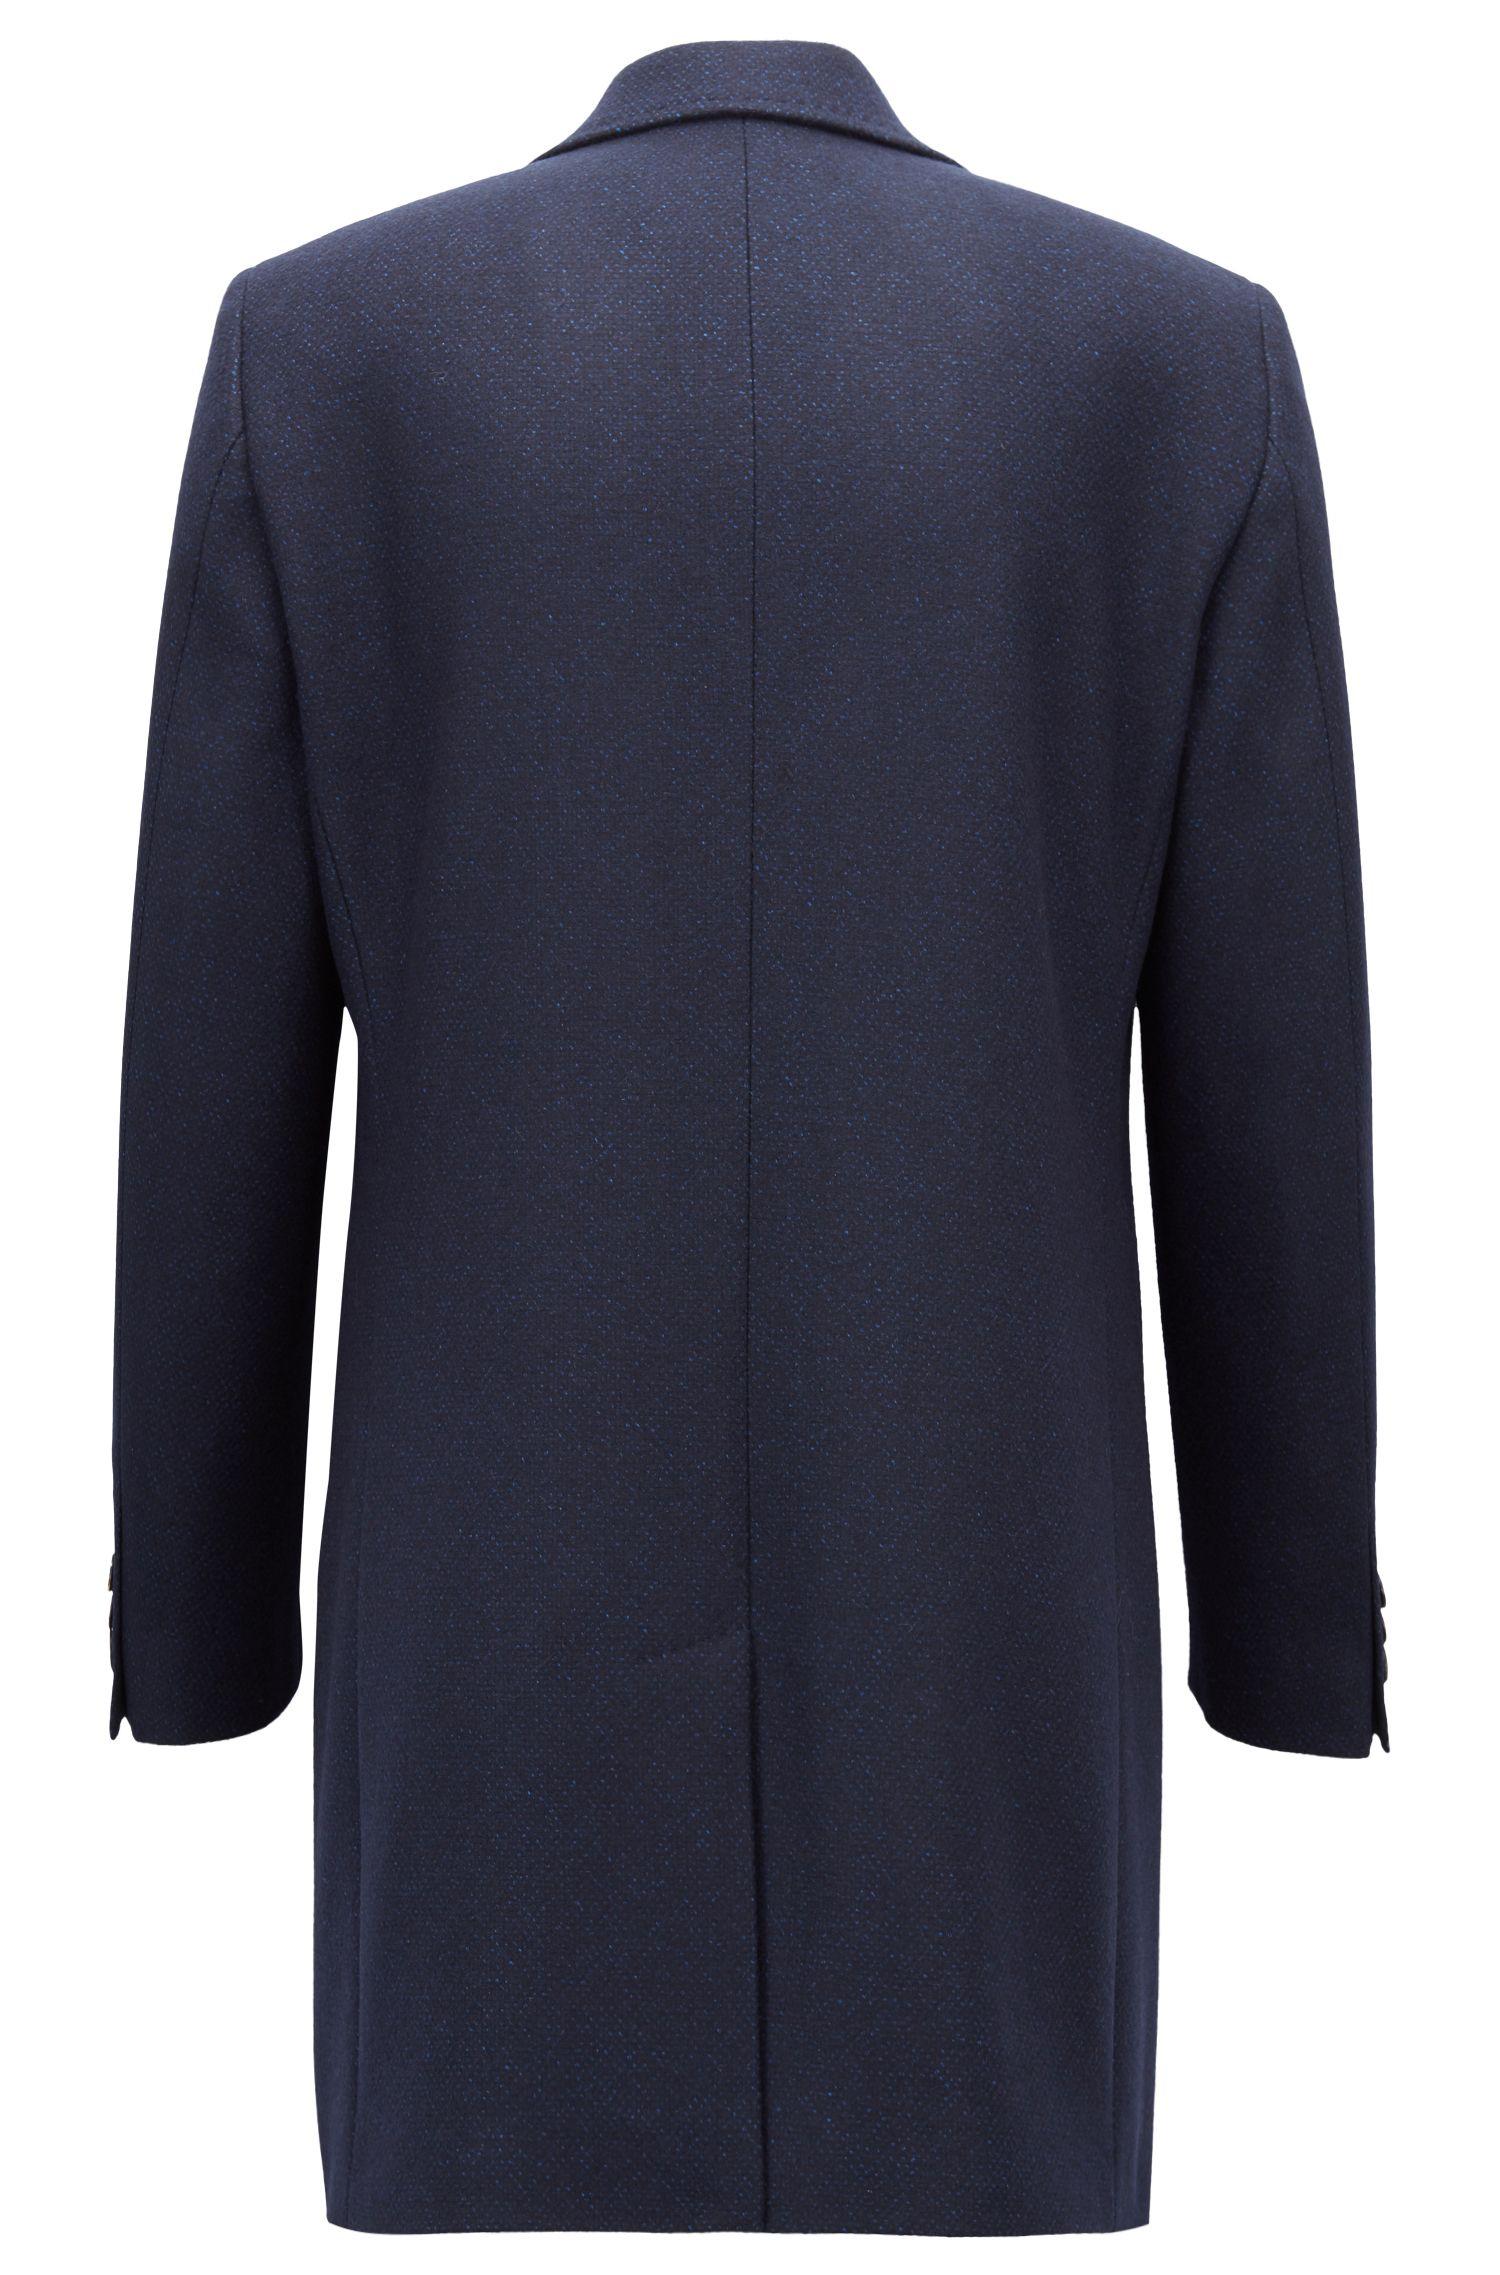 Single-breasted coat in a patterned wool blend, Open Blue